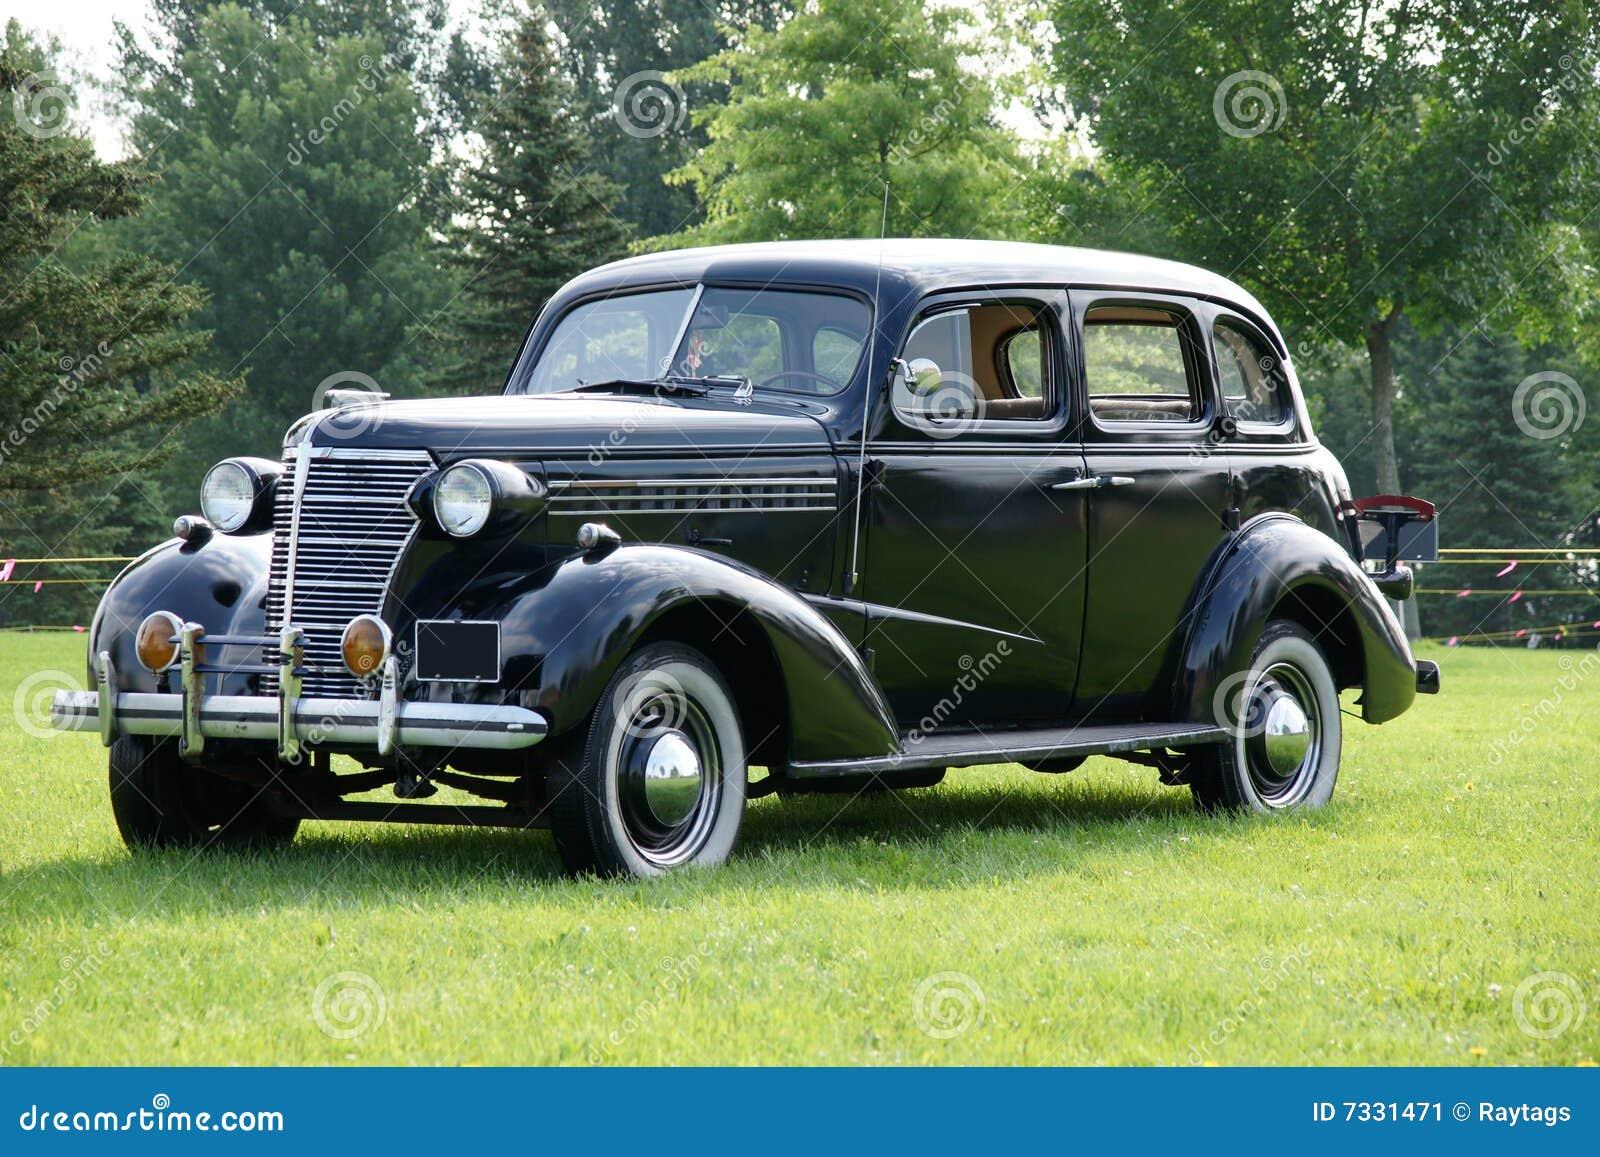 1938 chevrolet stock image image 7331471 for 1938 chevrolet 4 door sedan